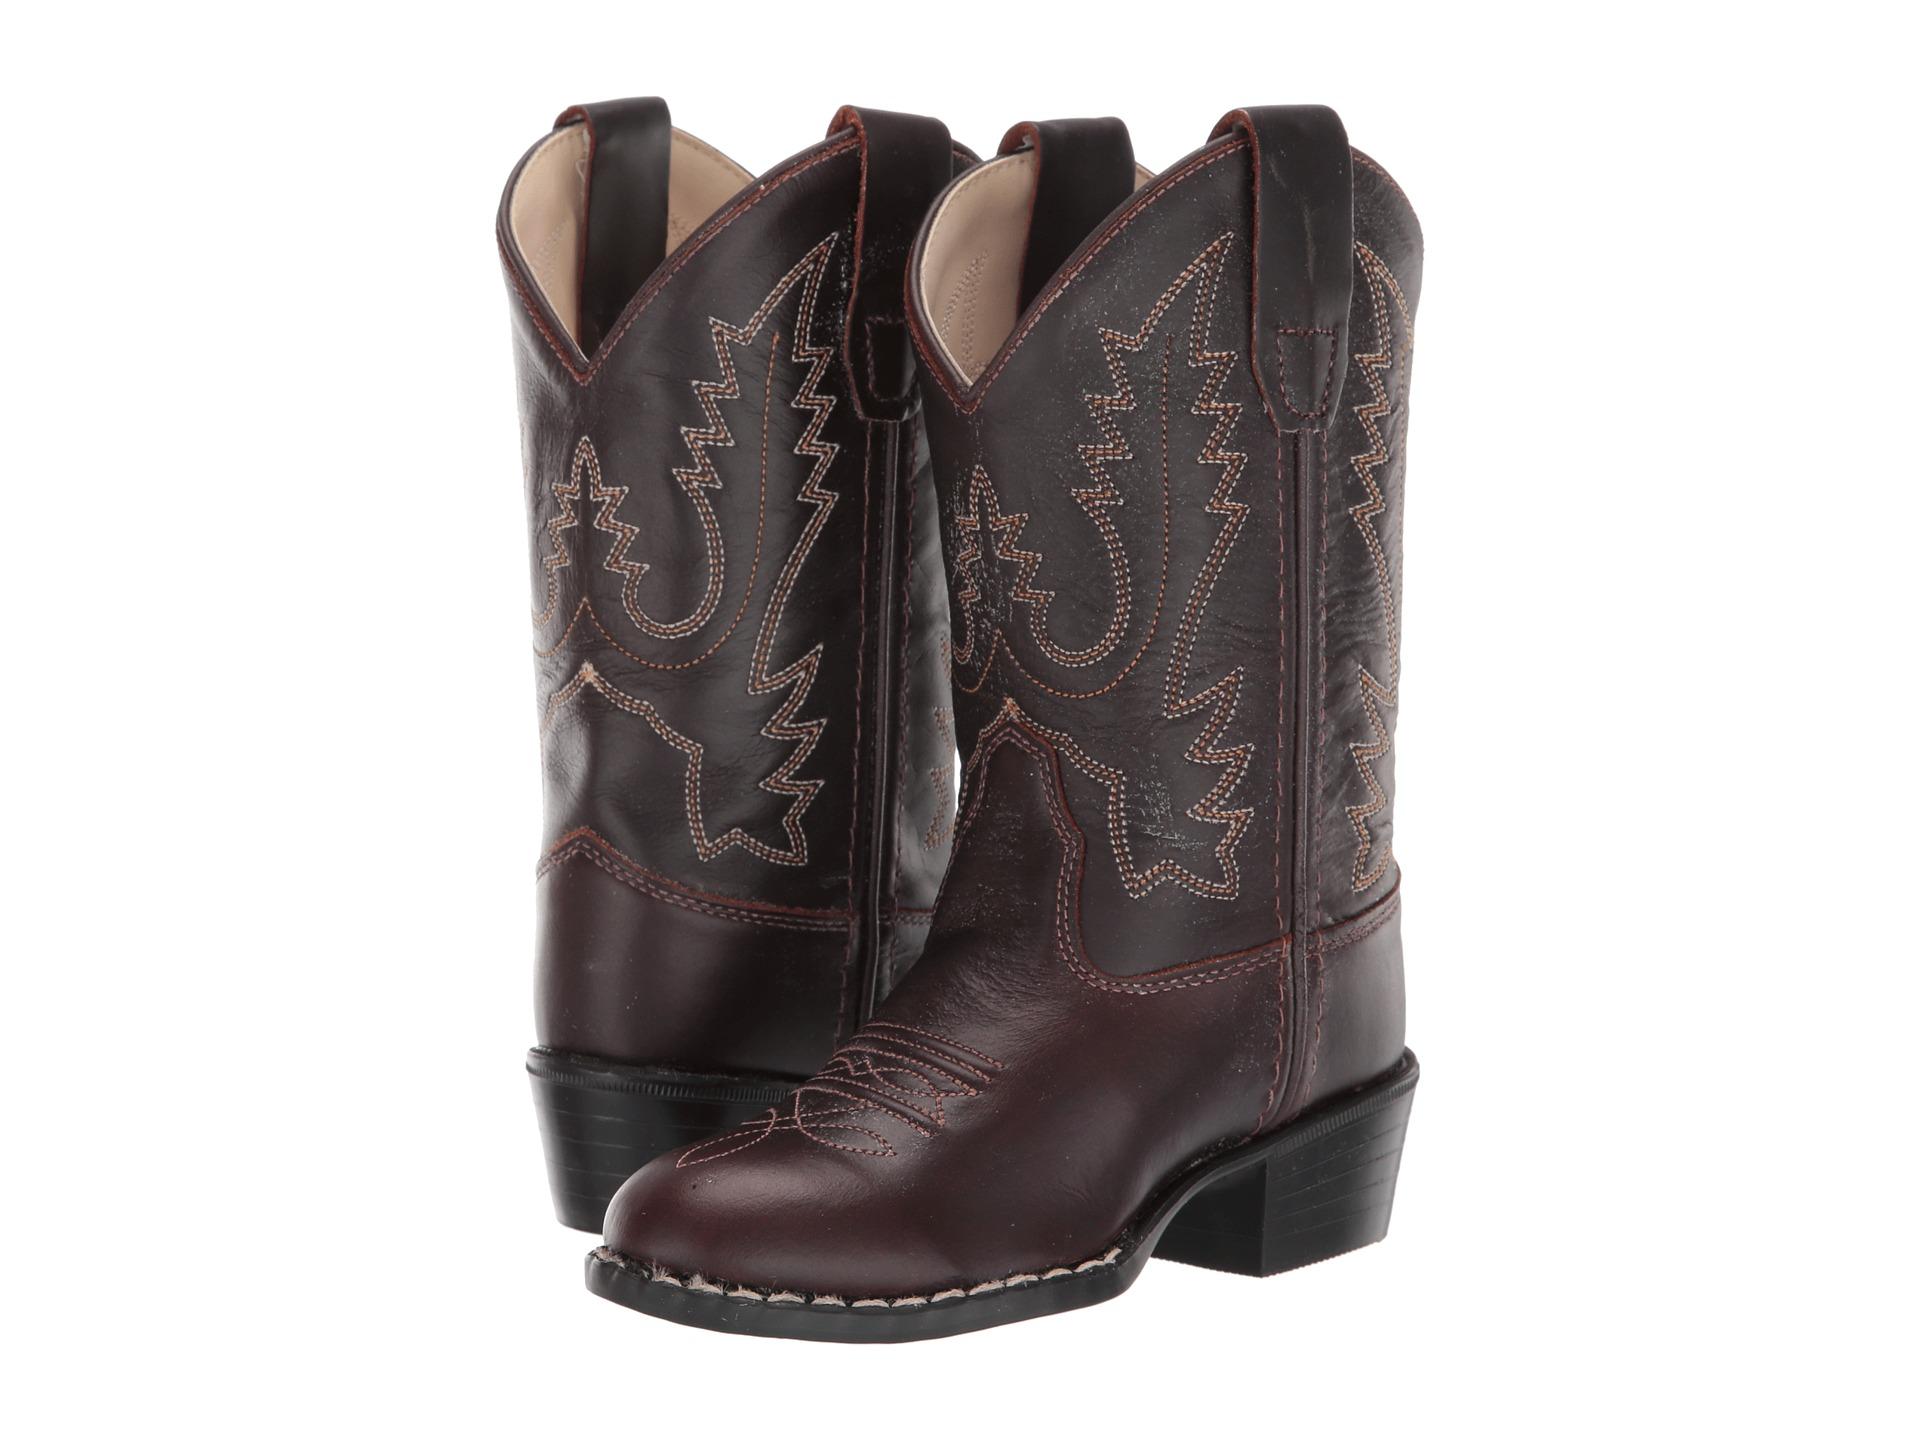 060c241194f Western Boots For Kids - Ivoiregion